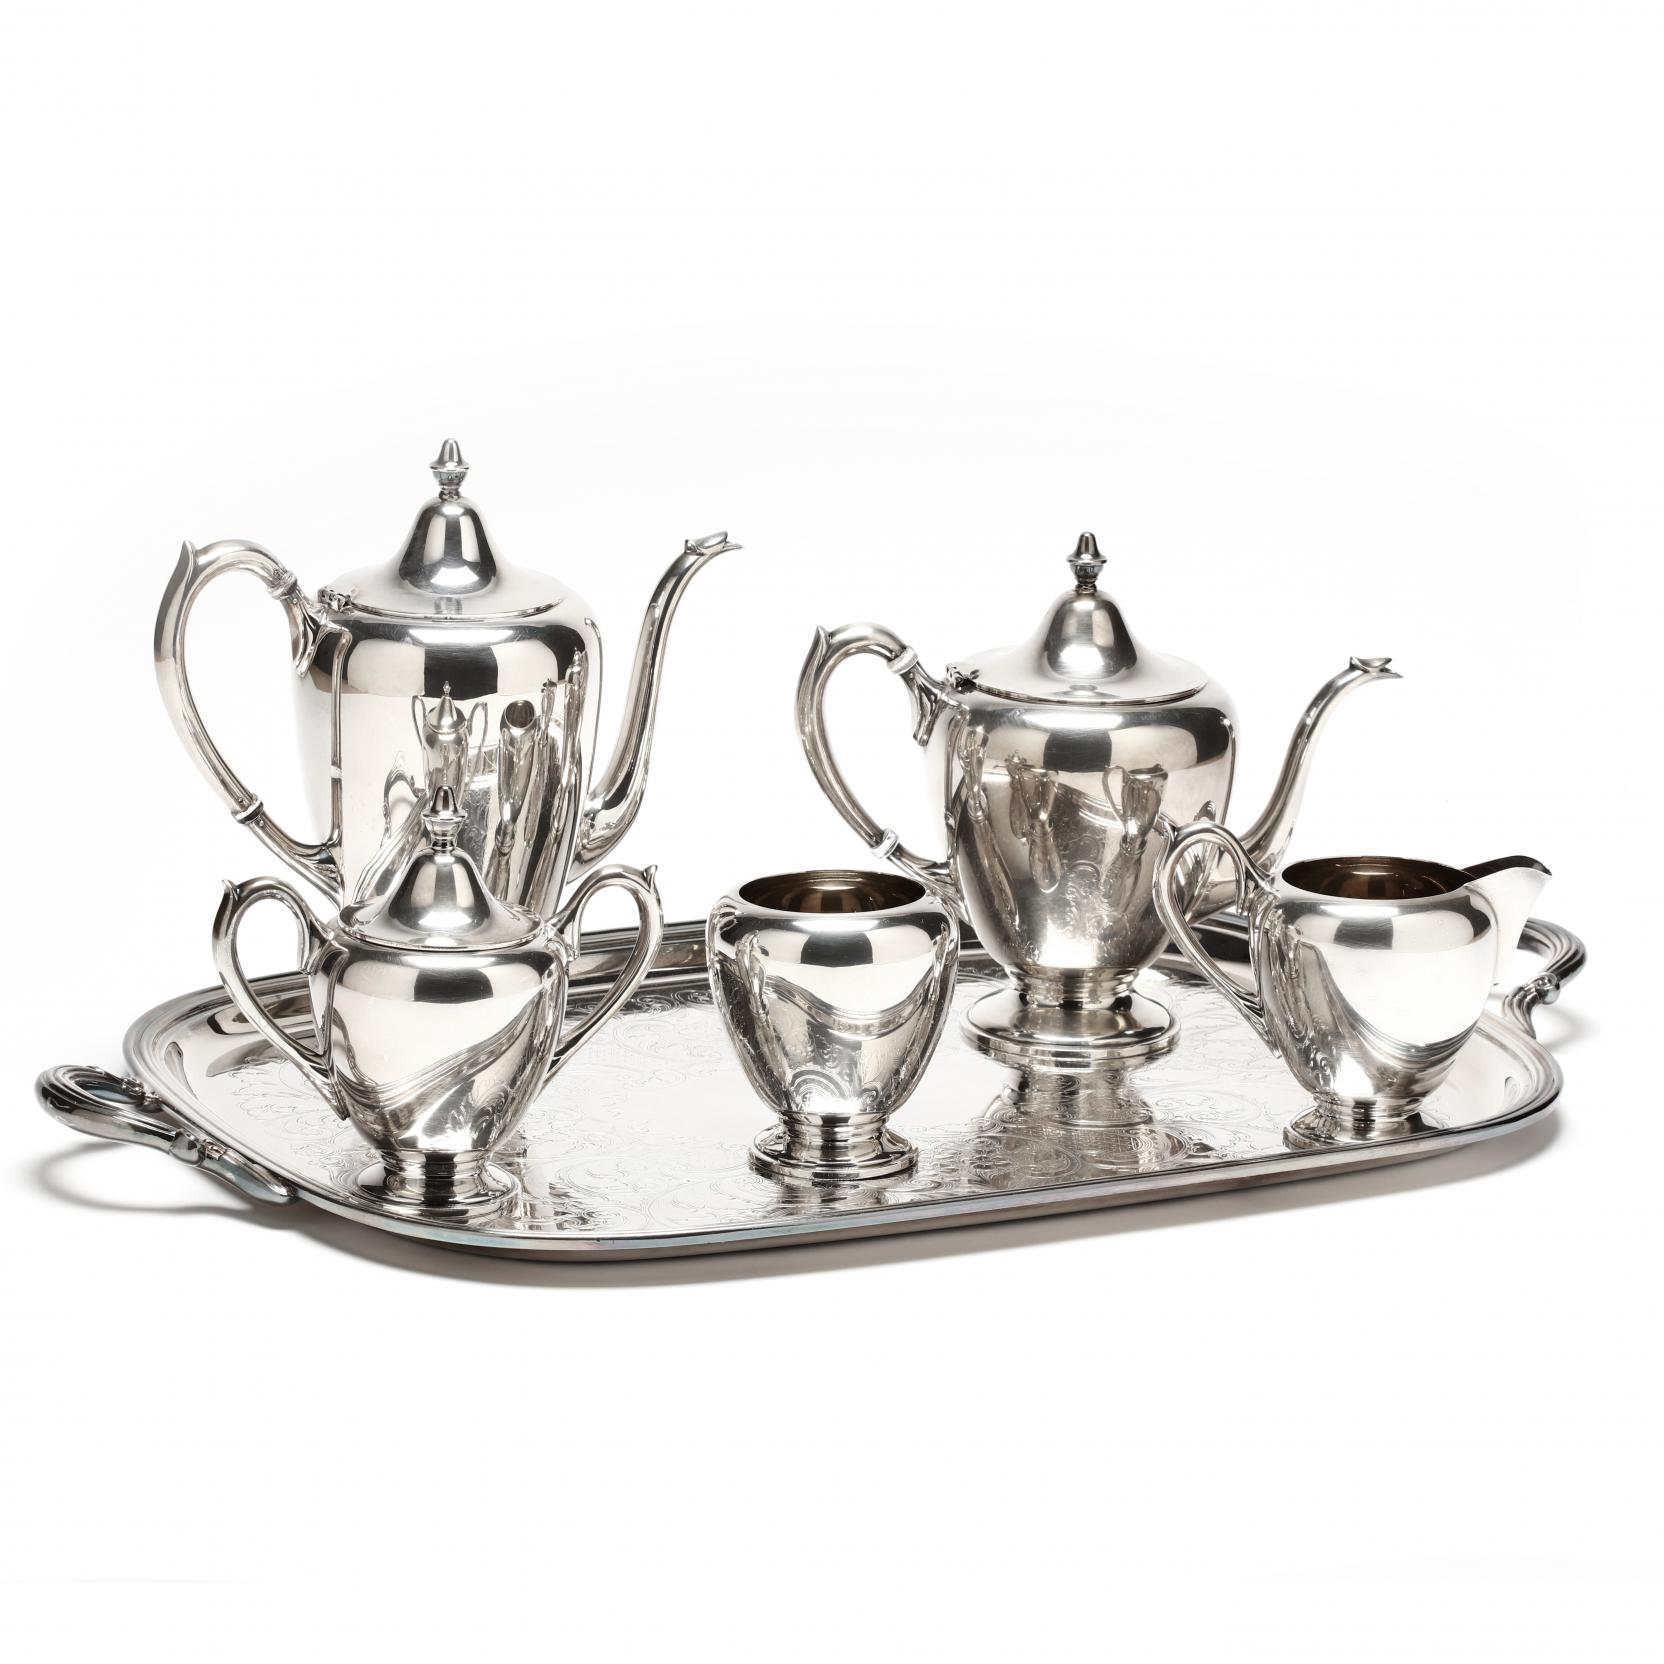 an-american-sterling-silver-tea-coffee-service